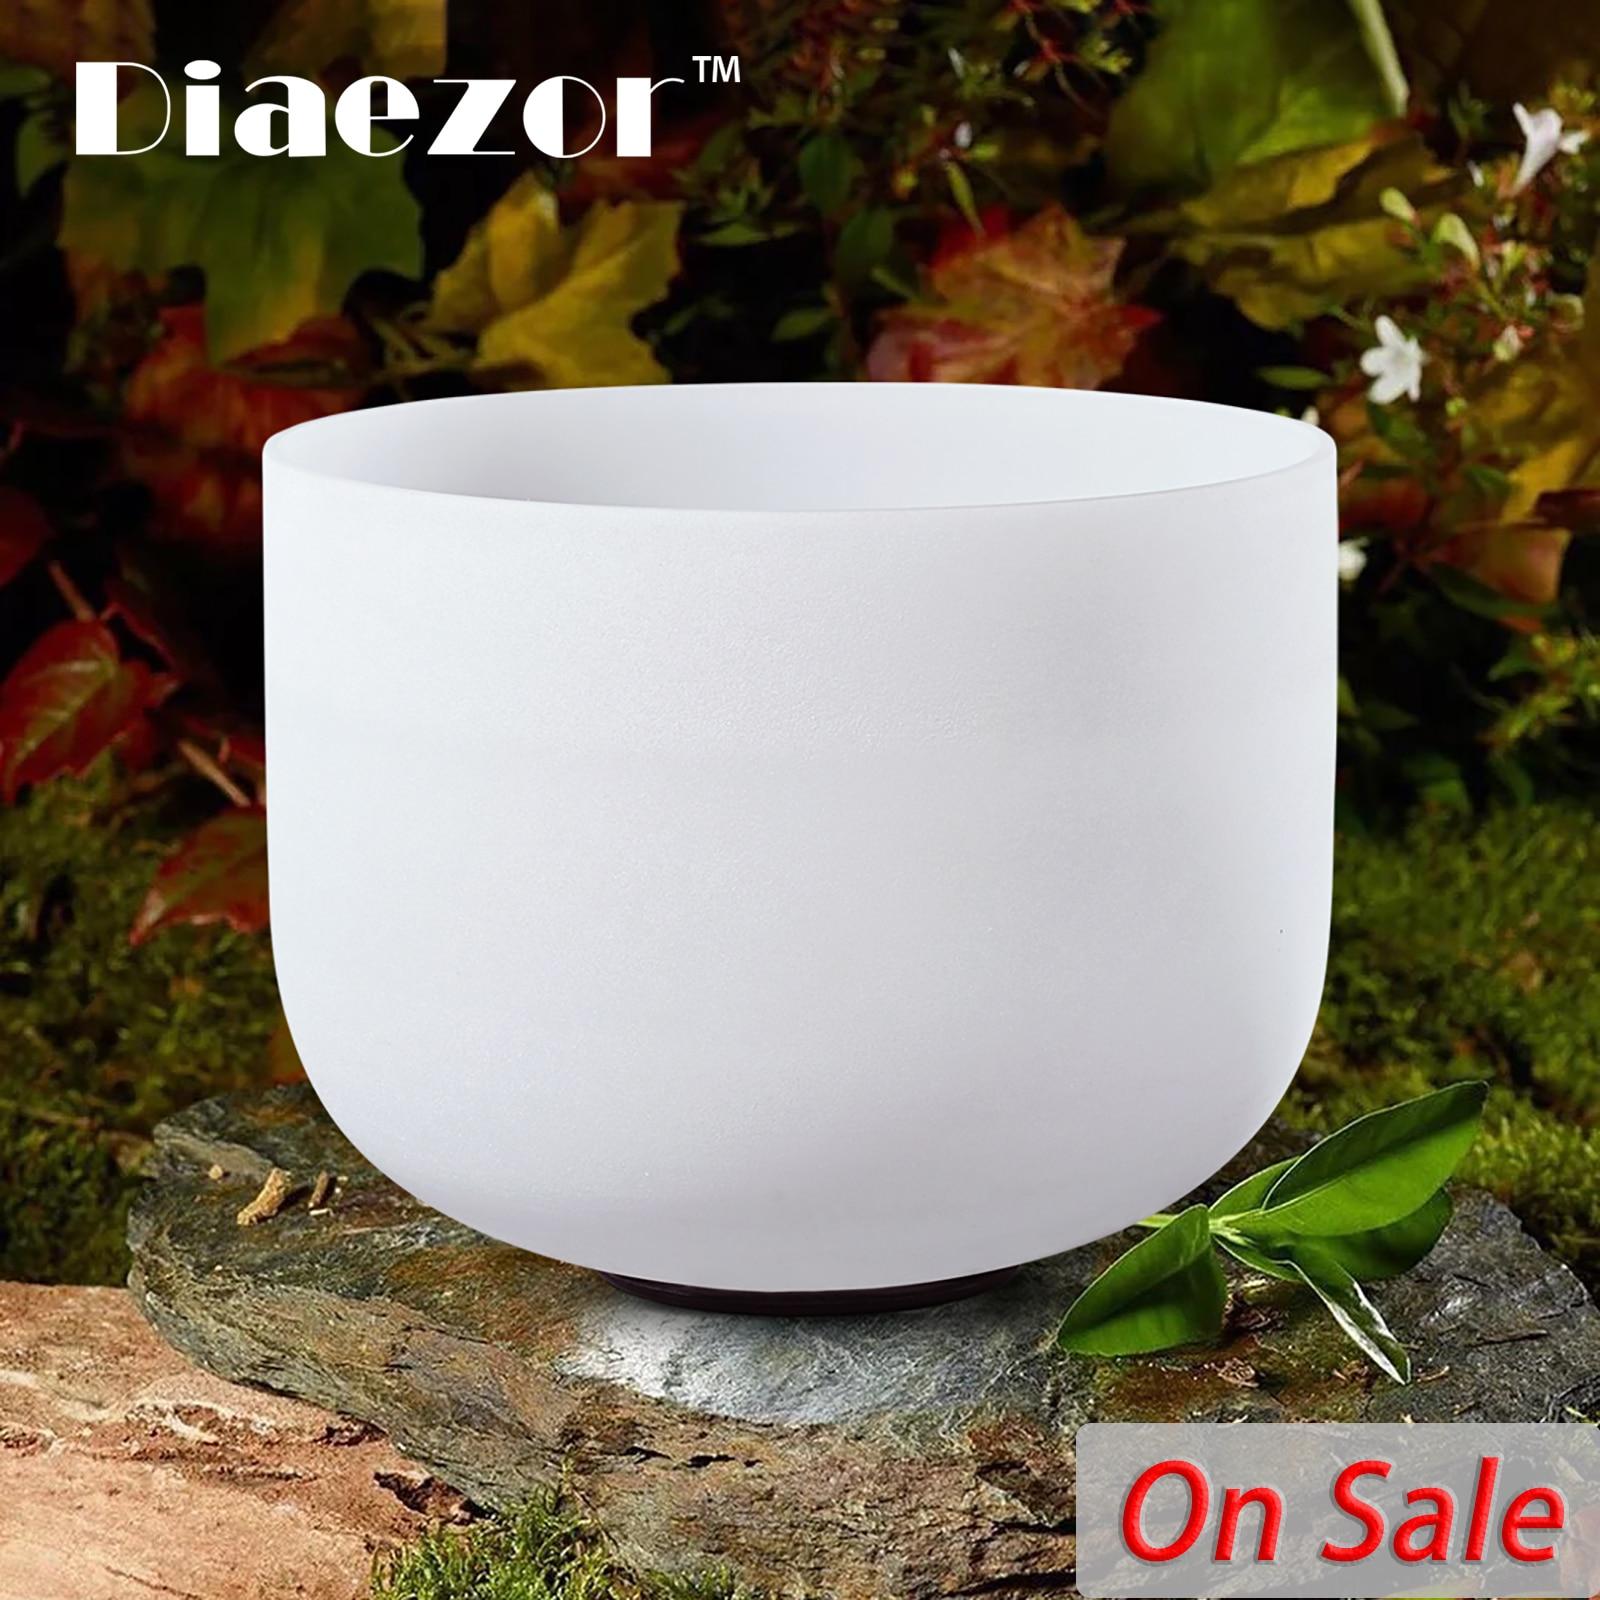 Diaezor 12 Inch Meditation Healing Chakra Stone Frosted Quartz Crystal Singing Bowl C D E F G A B 12